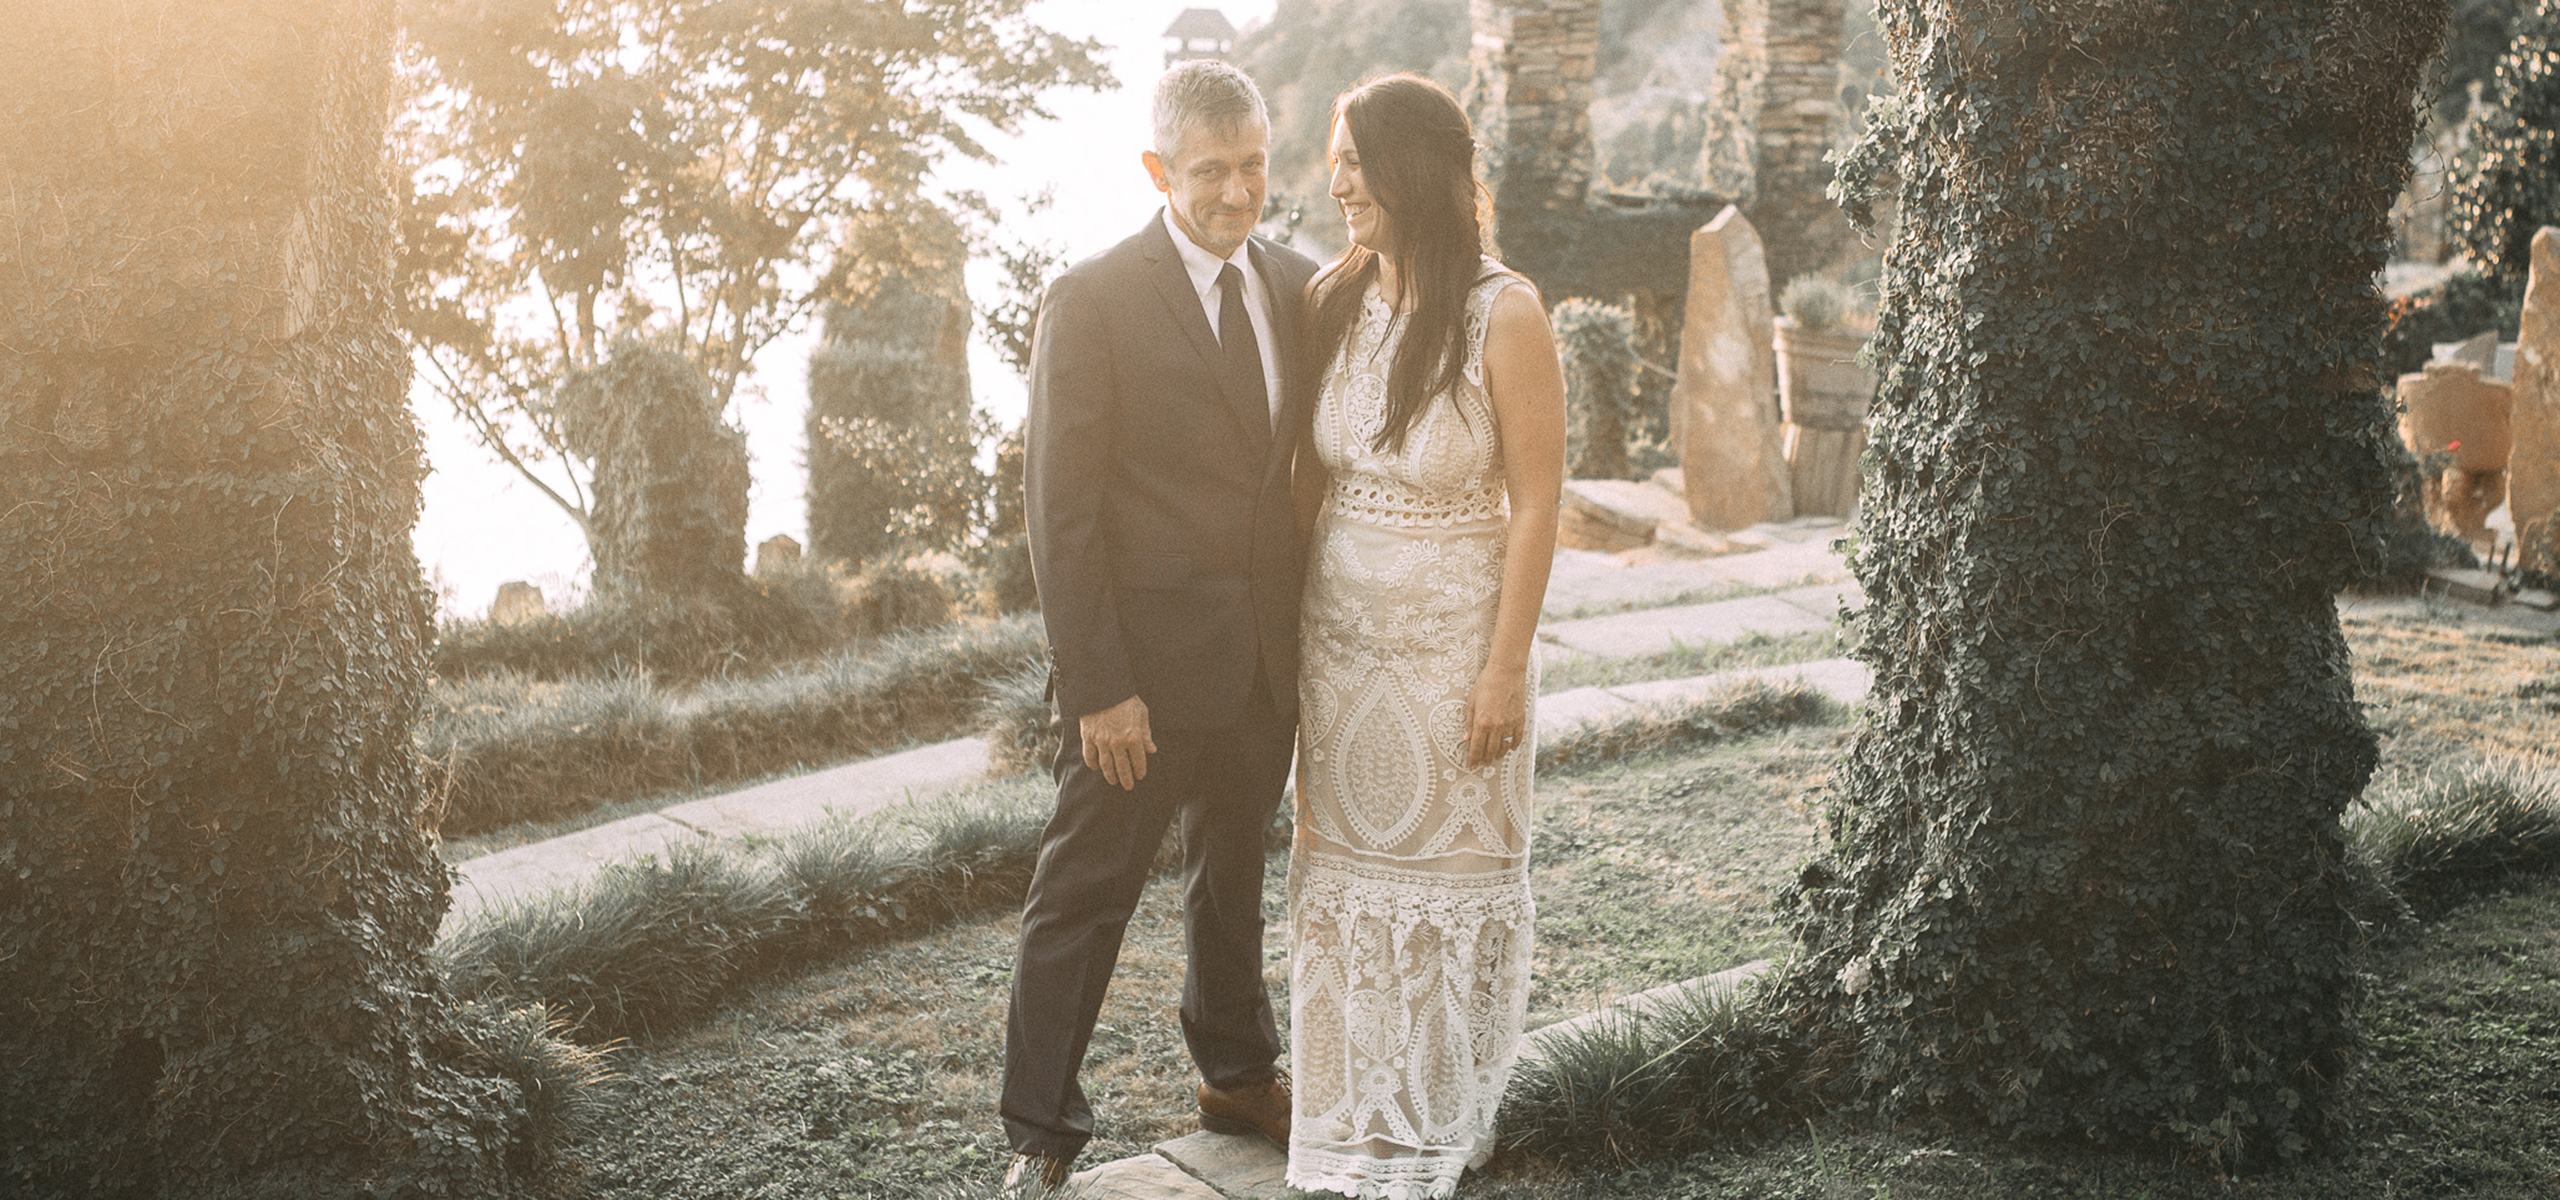 Visalia California Wedding Photography + Elopement Photography